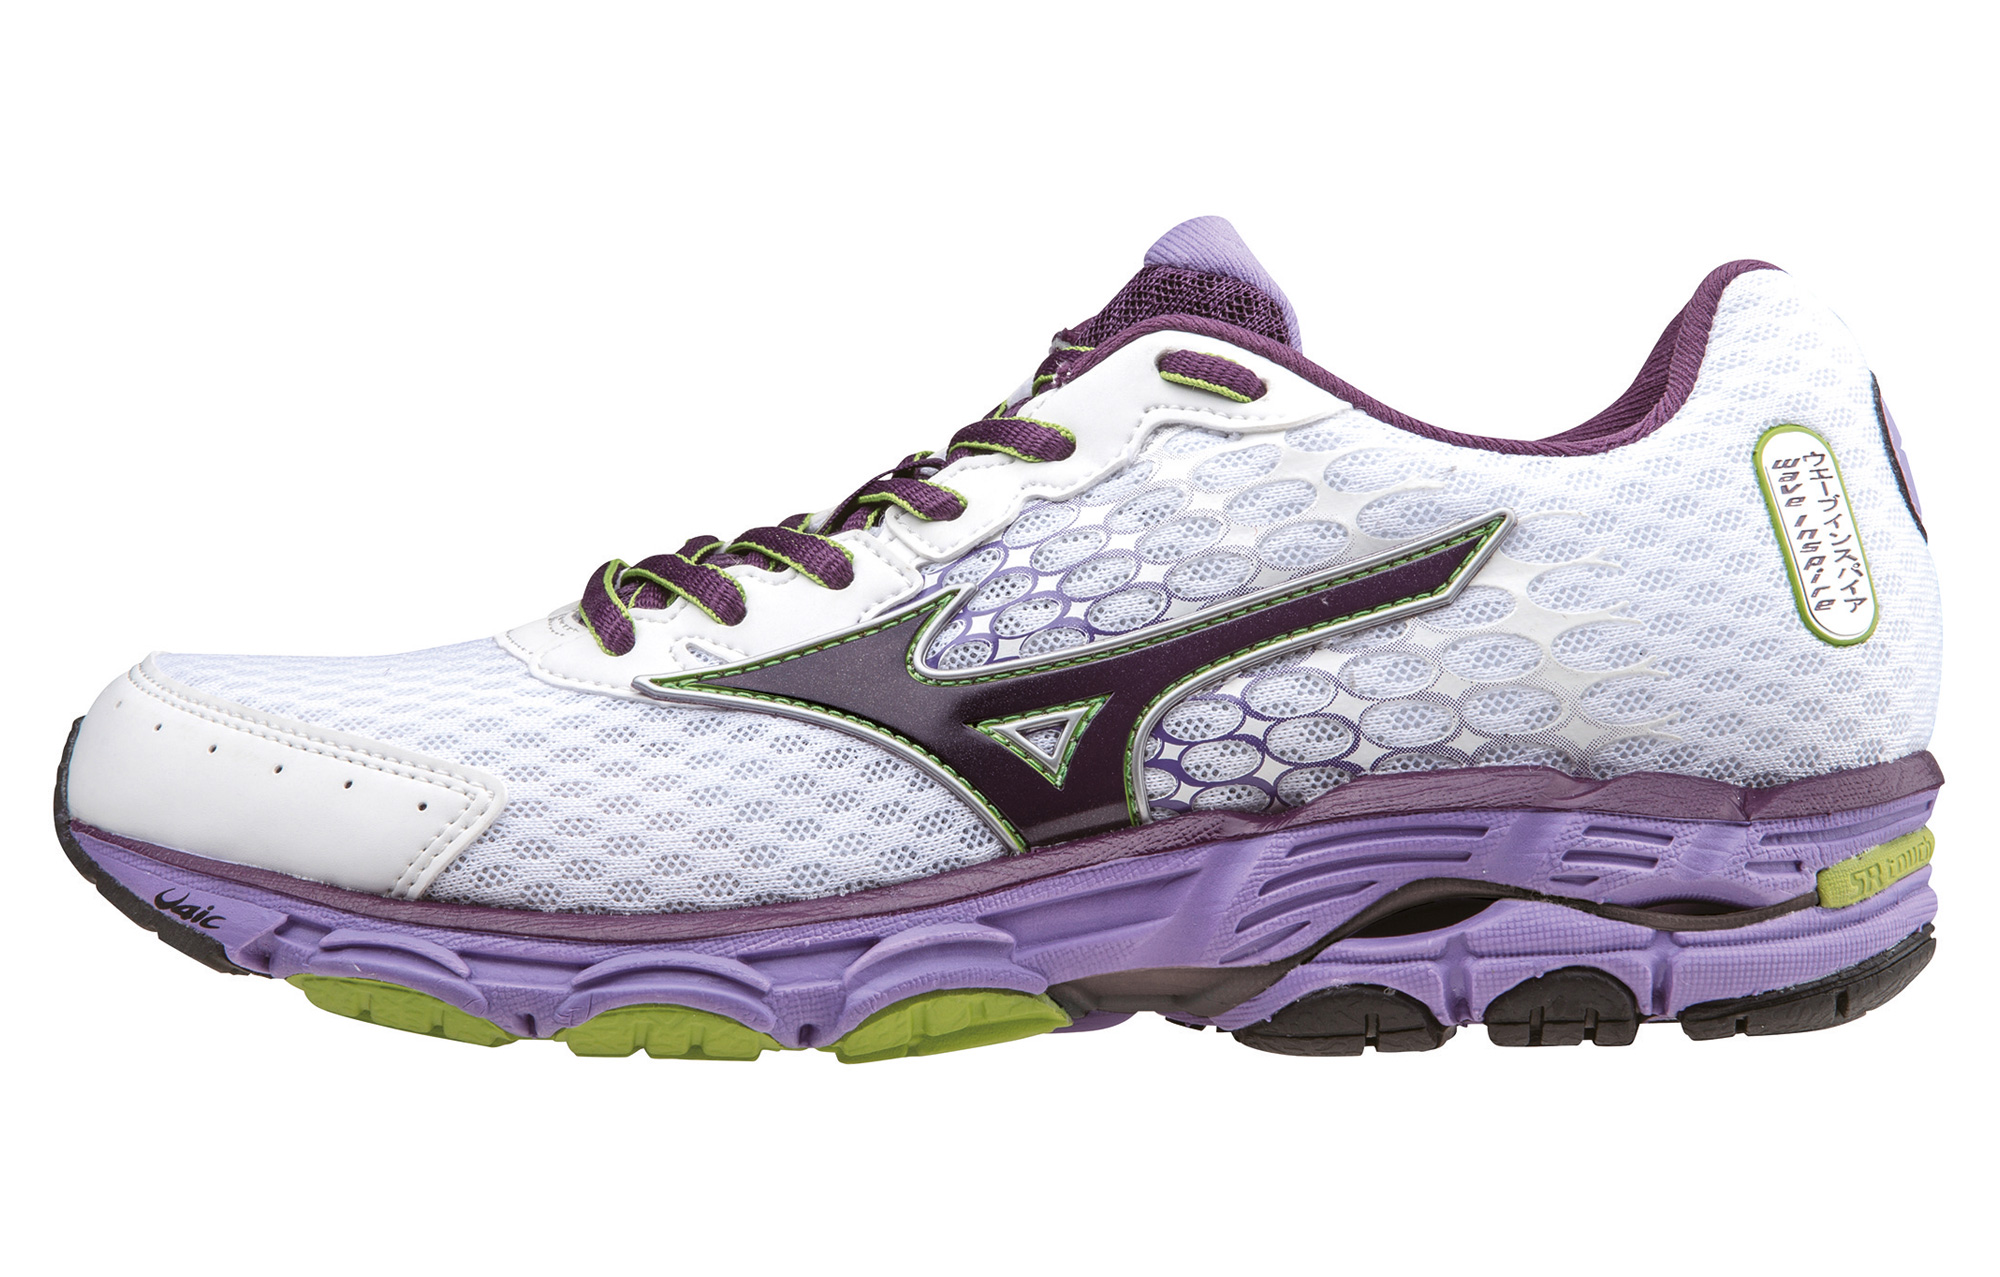 7dfce807fe Chaussures de Triathlon Femme Mizuno WAVE INSPIRE 11 Blanc / Violet ...